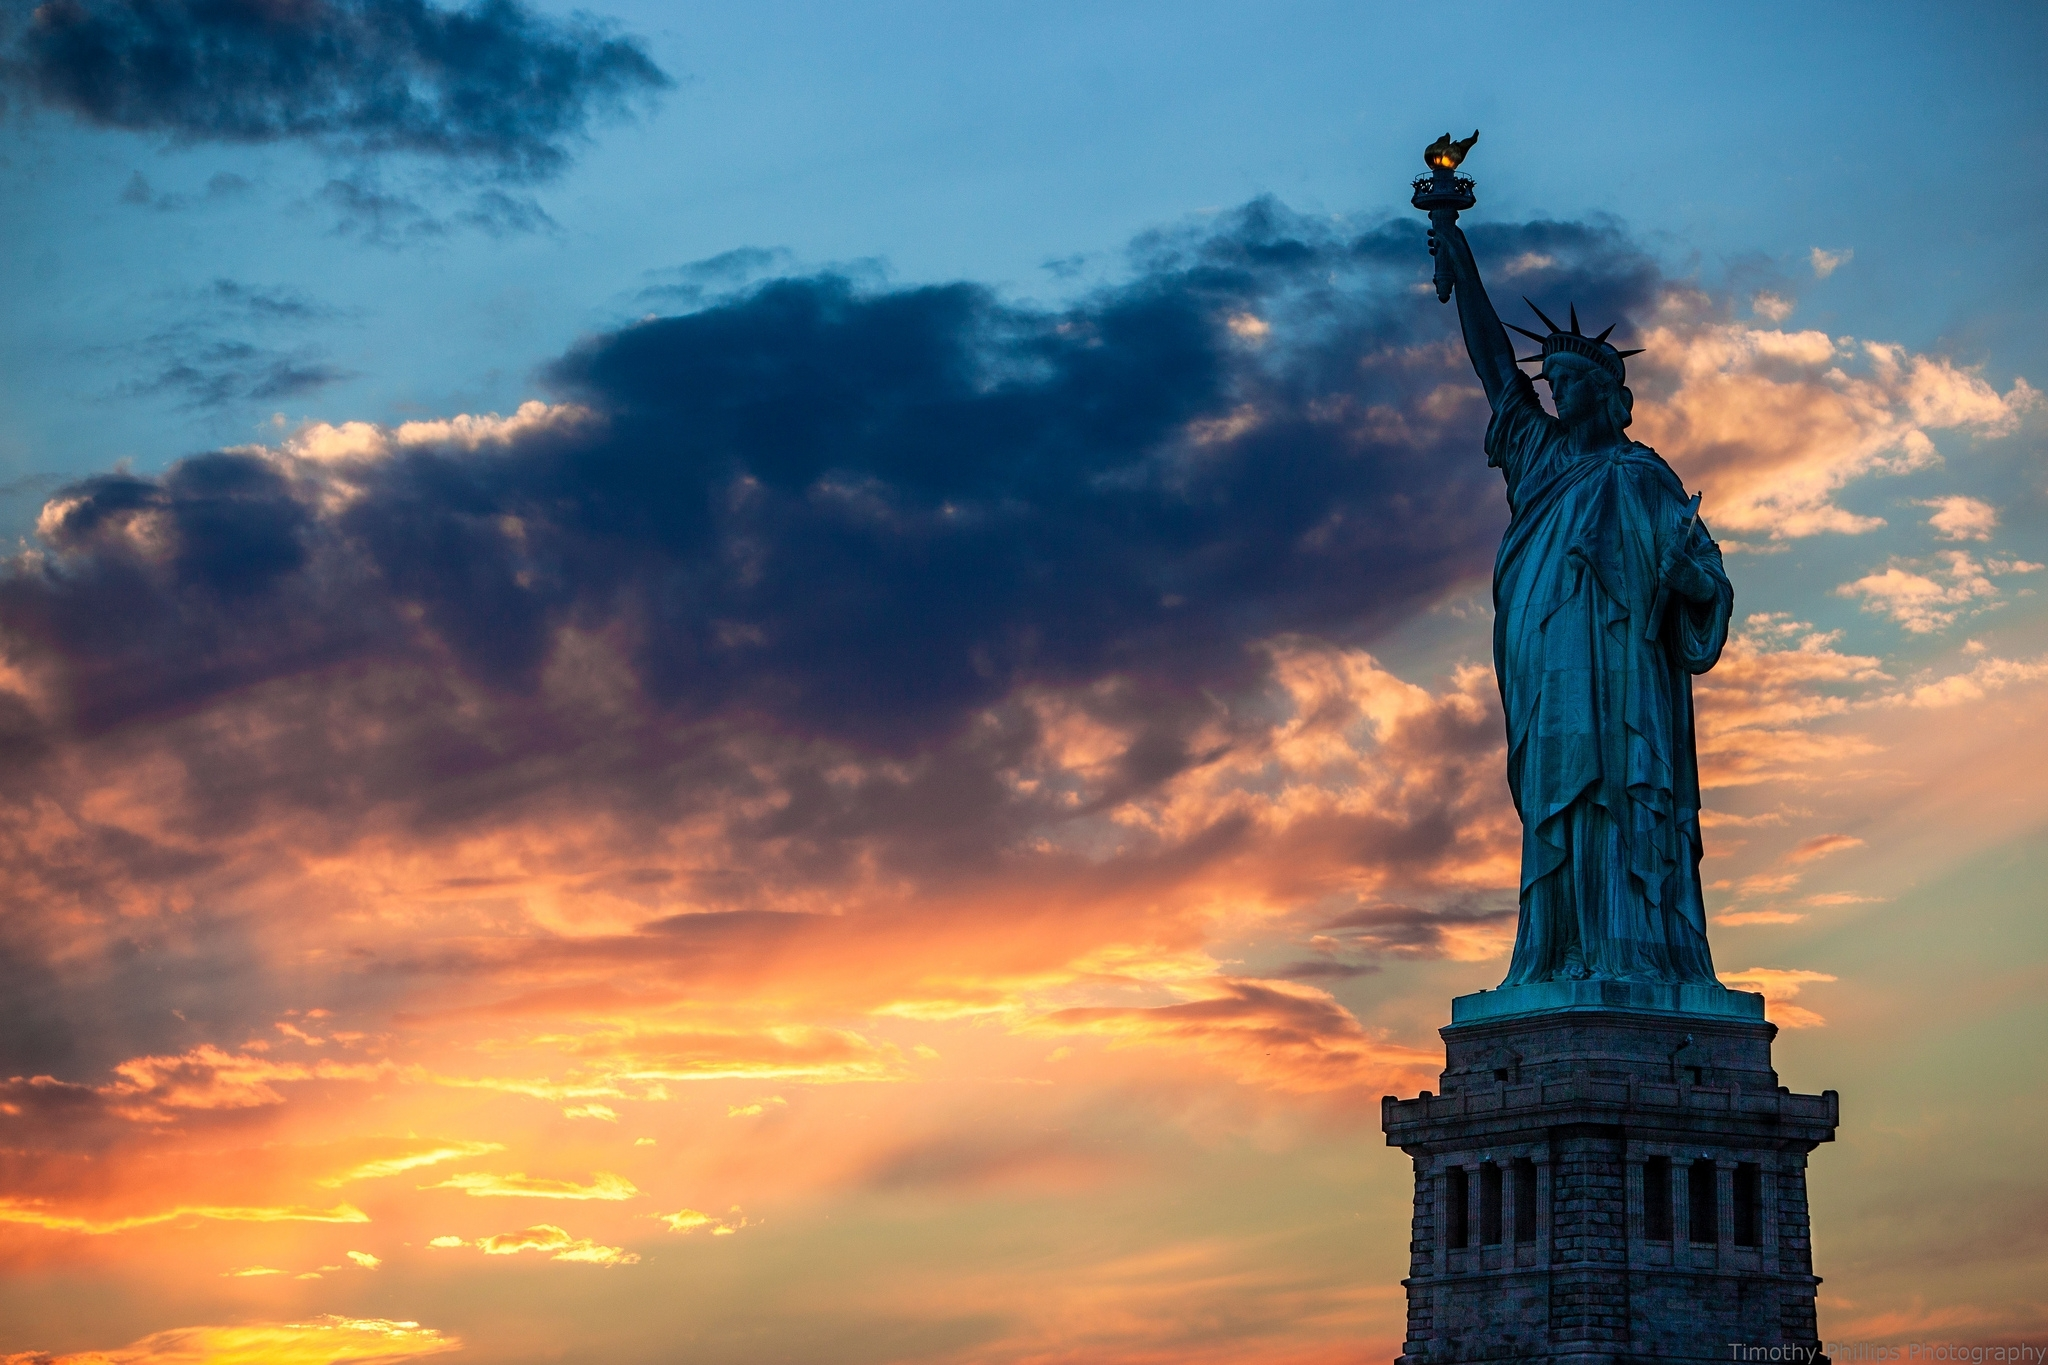 statue of liberty full hd fond d'écran and arrière-plan | 2048x1365